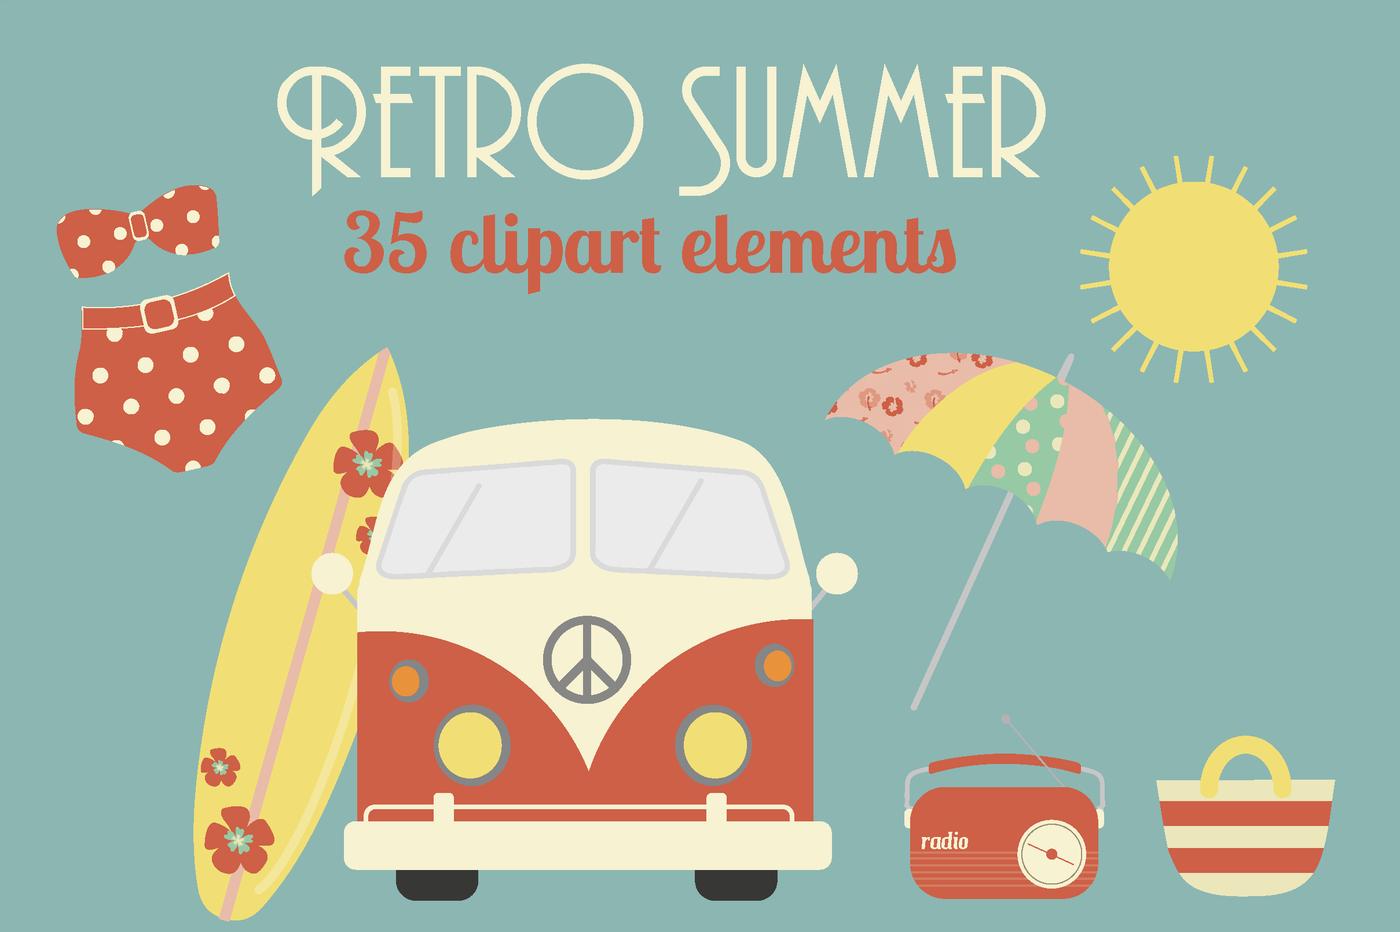 Retro Summer clipart By Poppymoon Design   TheHungryJPEG.com